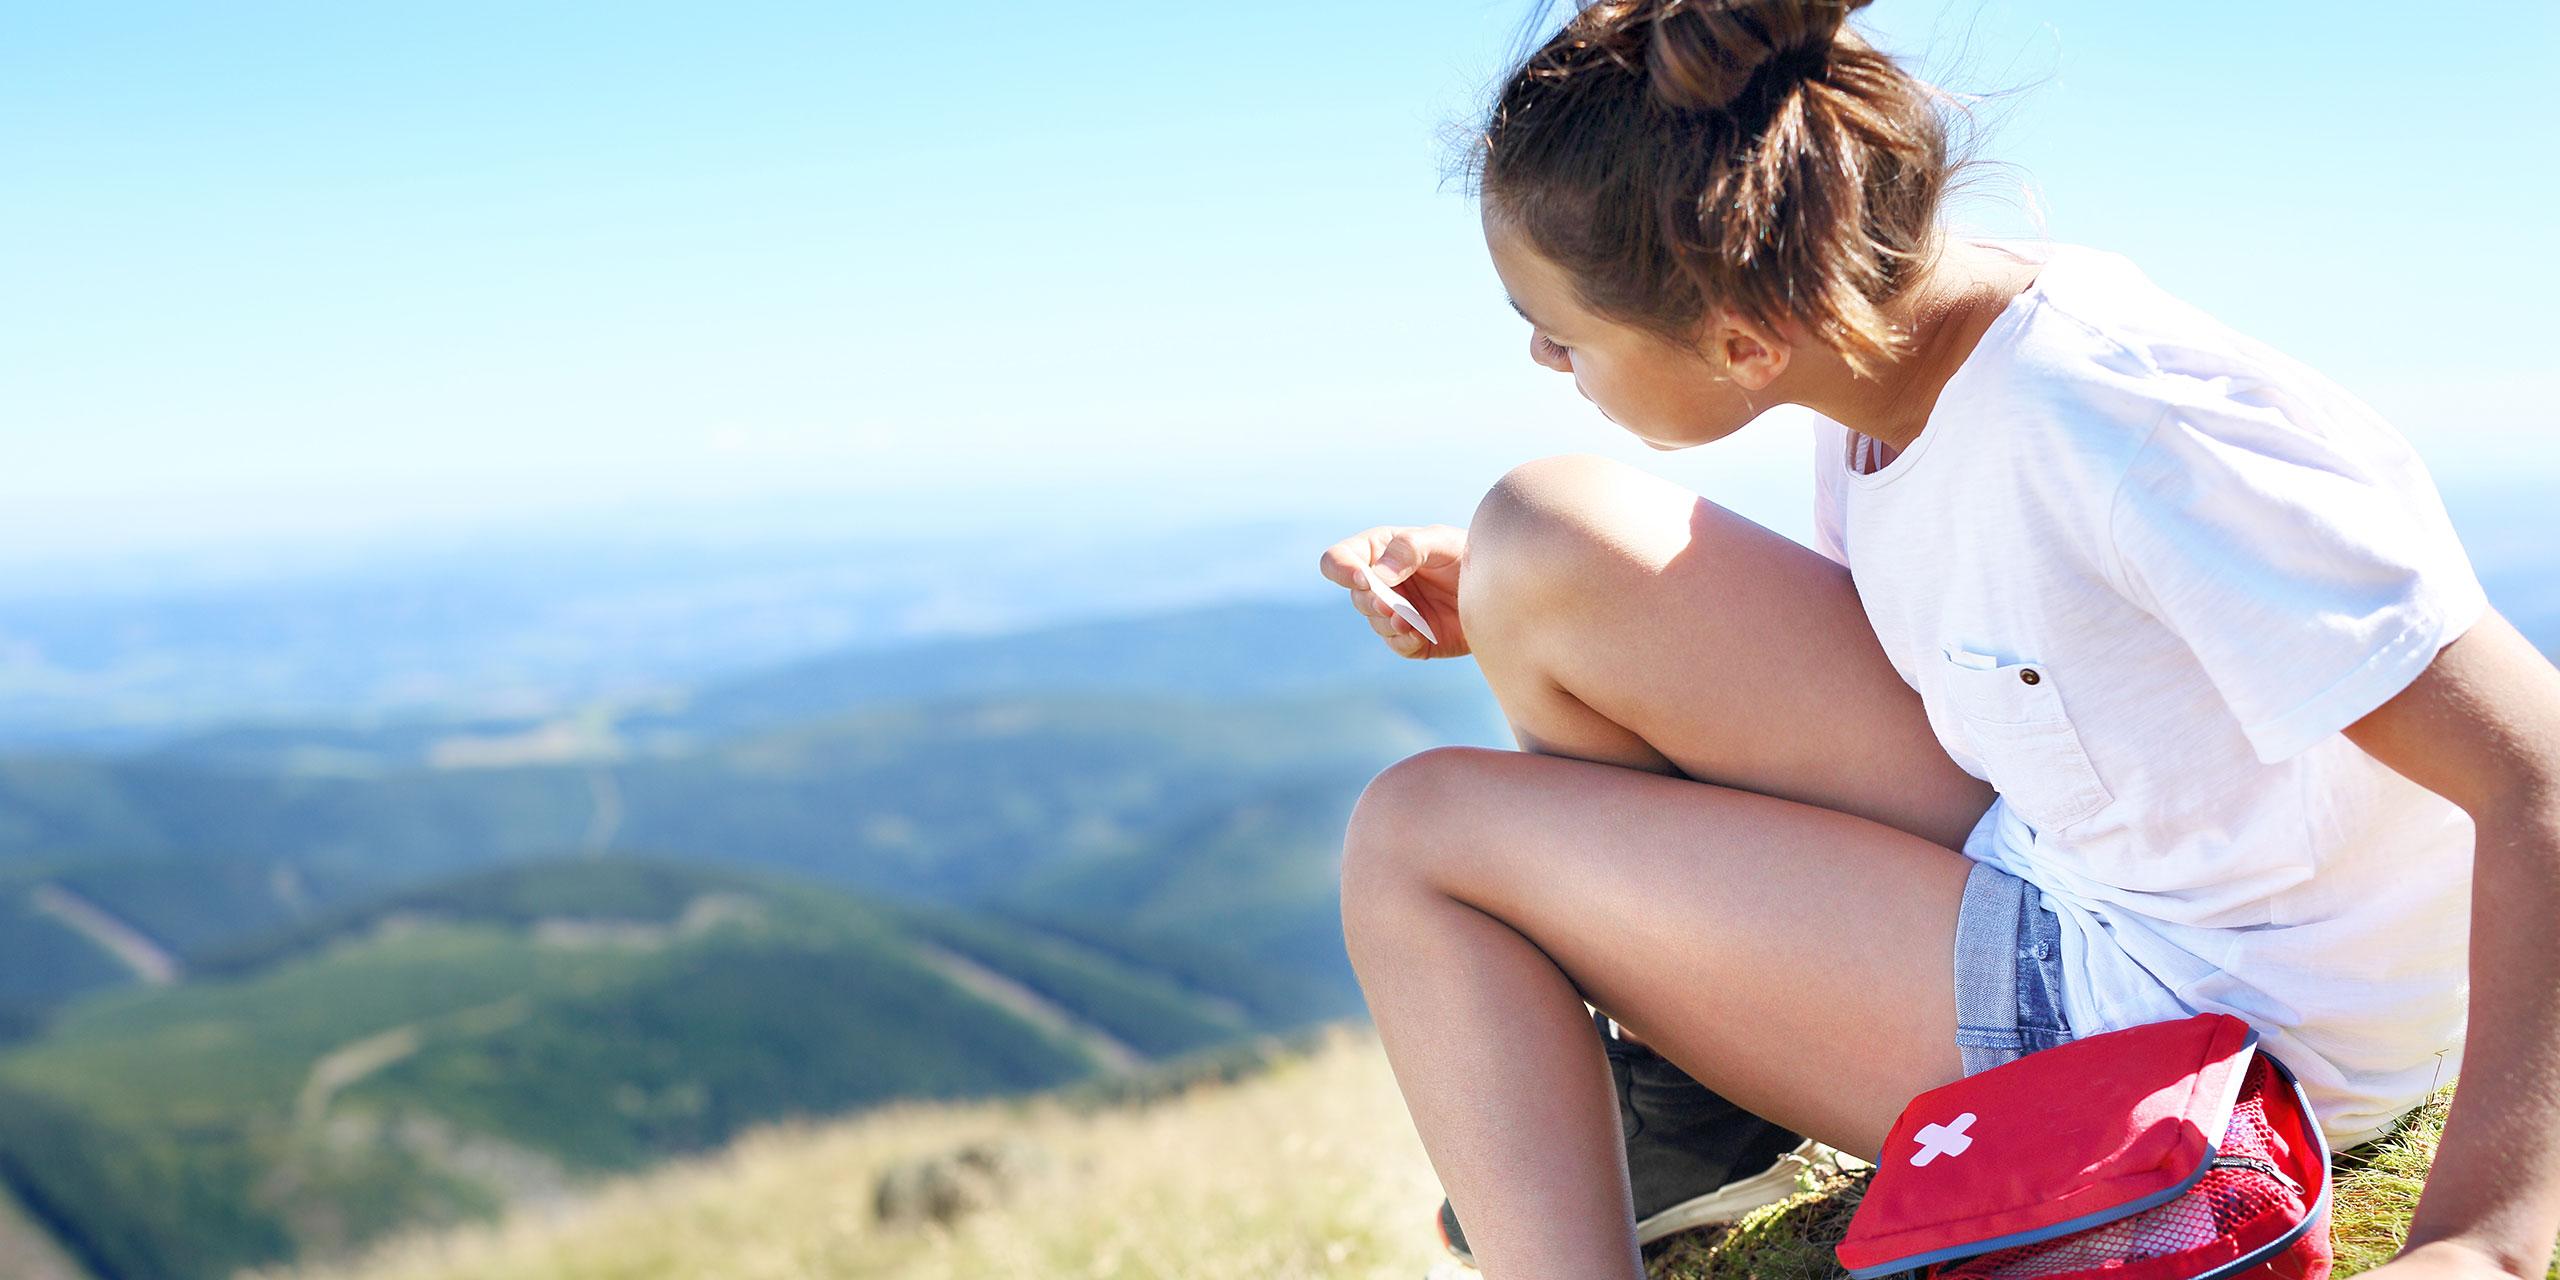 Vacation Injury; Courtesy of Robert Przybysz/Shutterstock.com